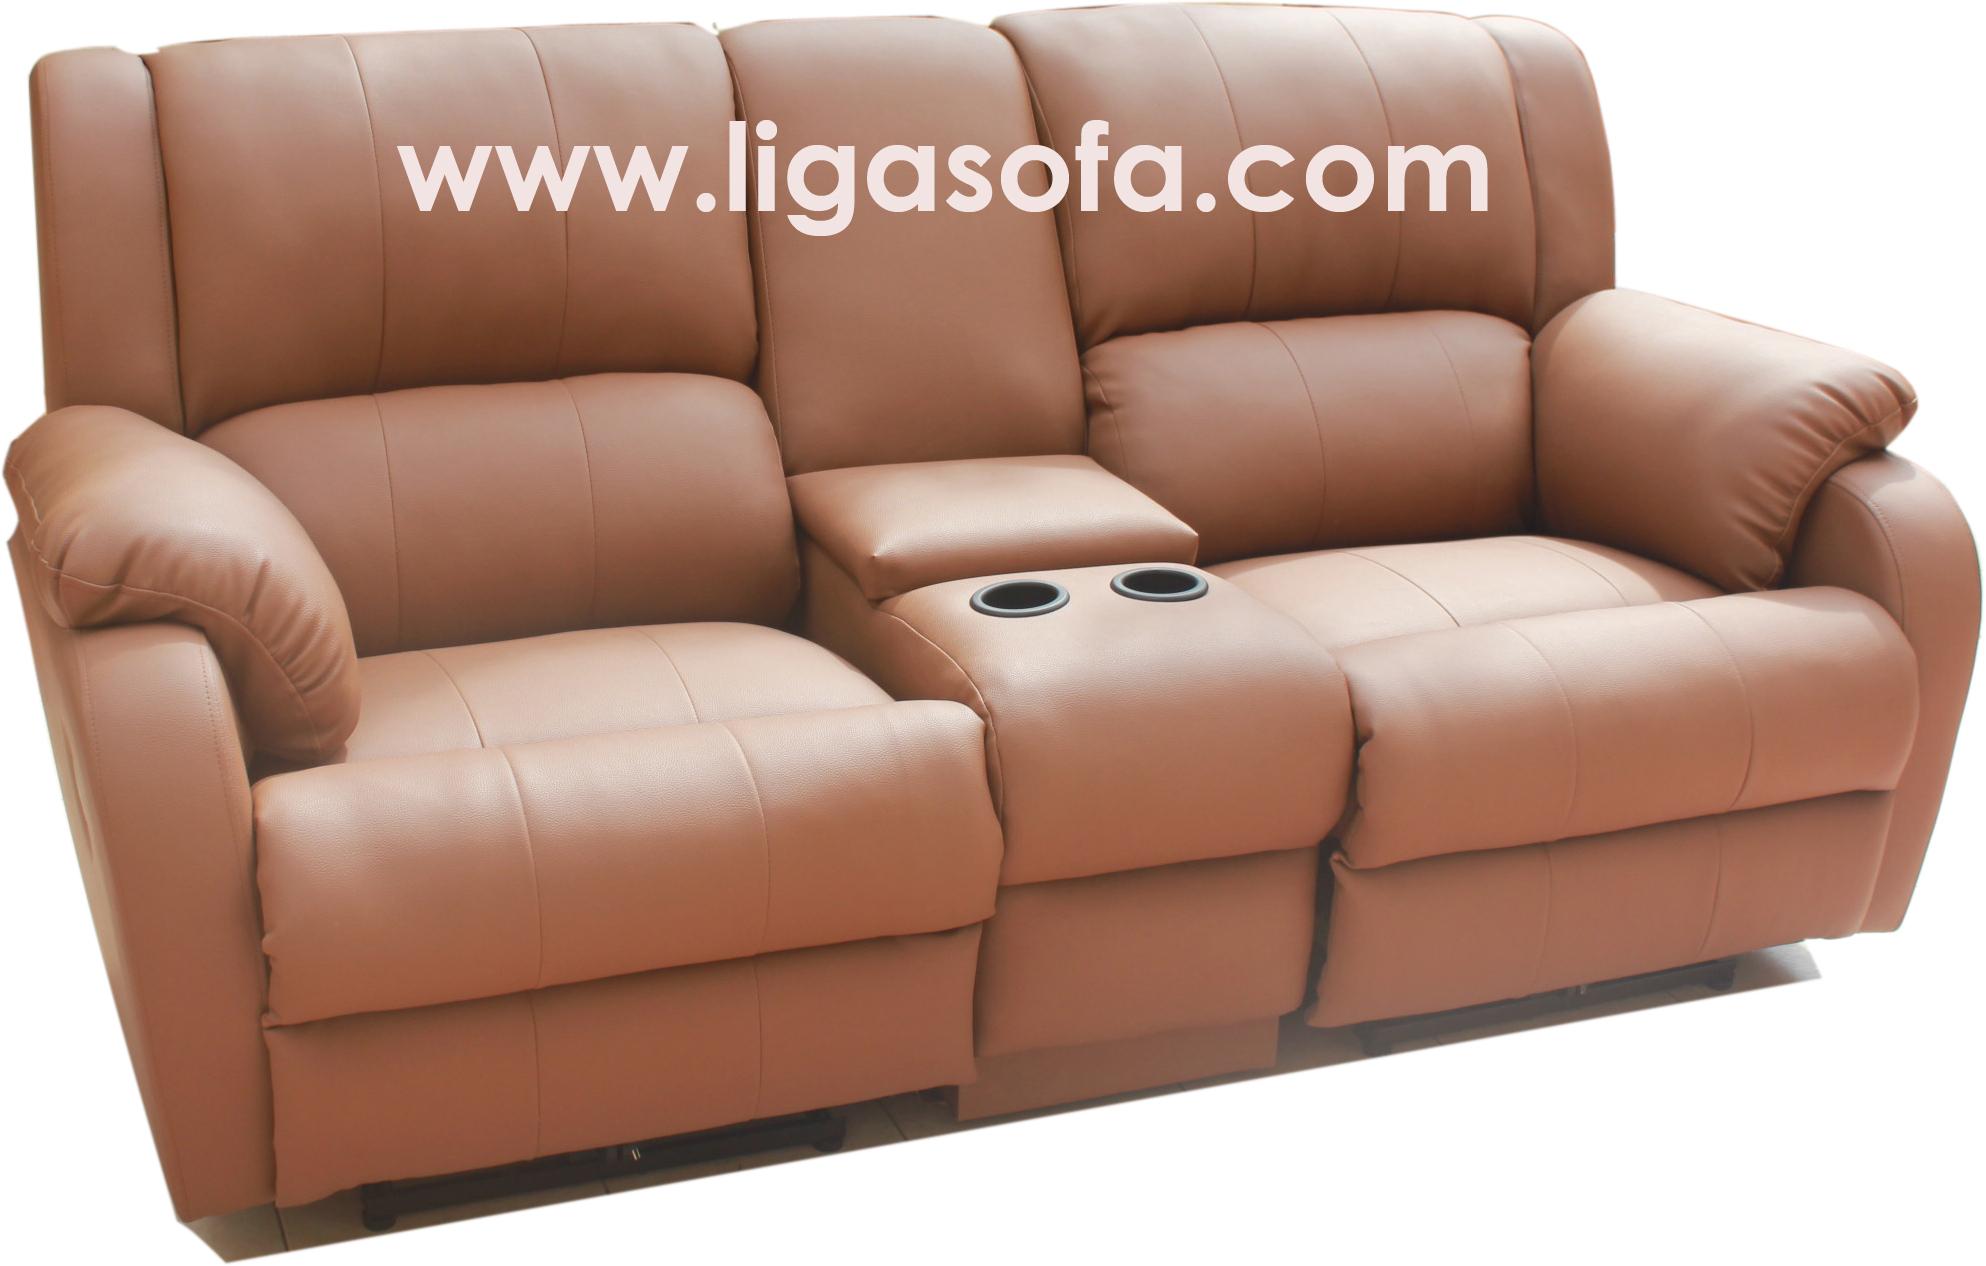 Jual Sofa Dan Service Jakarta Dgn